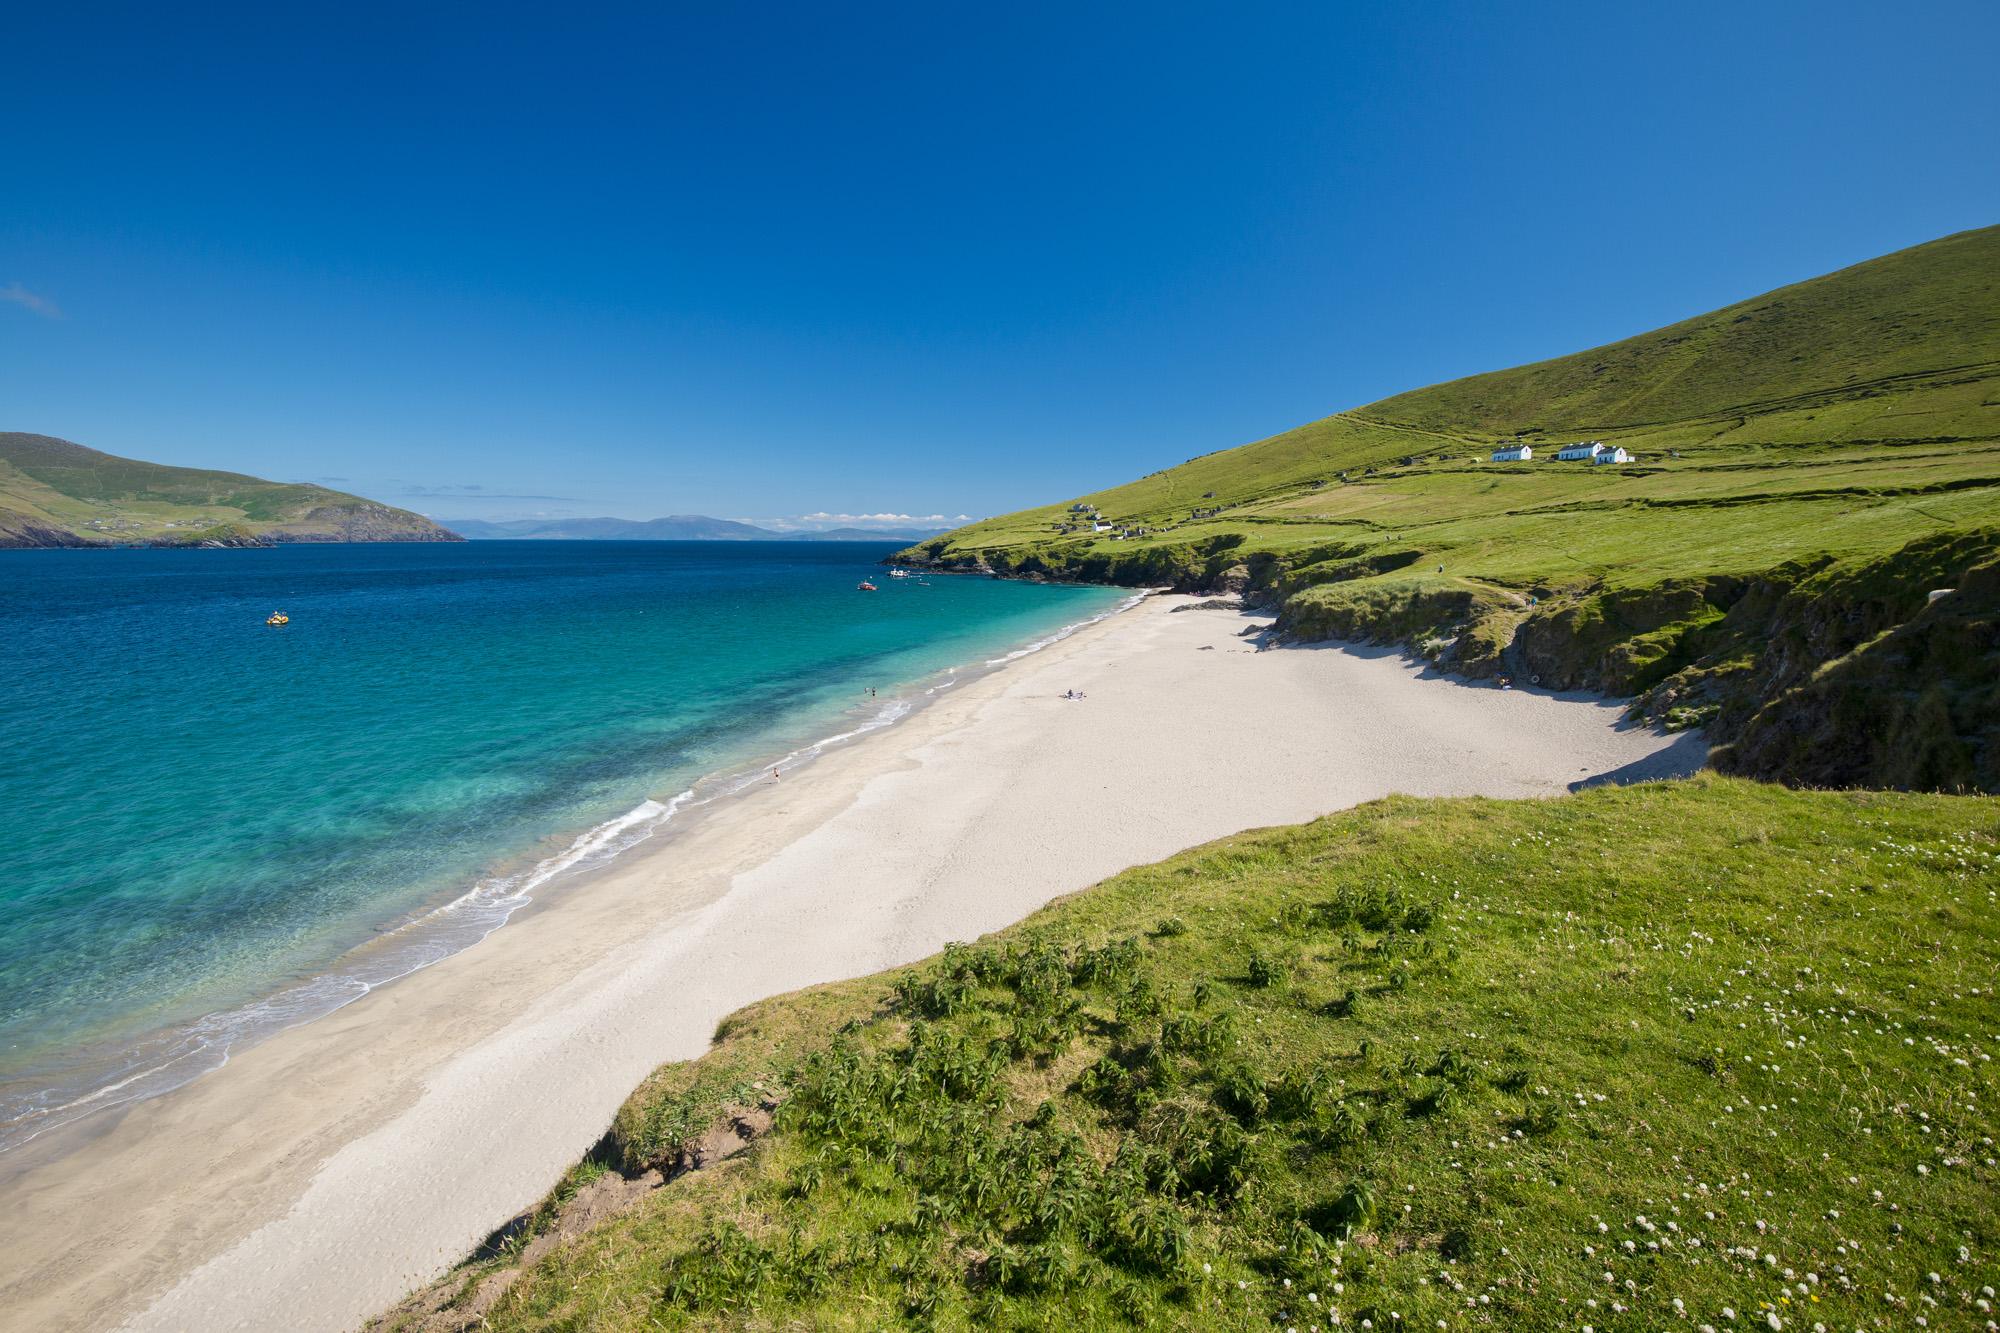 OlafSchubert_Irland_Blasket_Islands